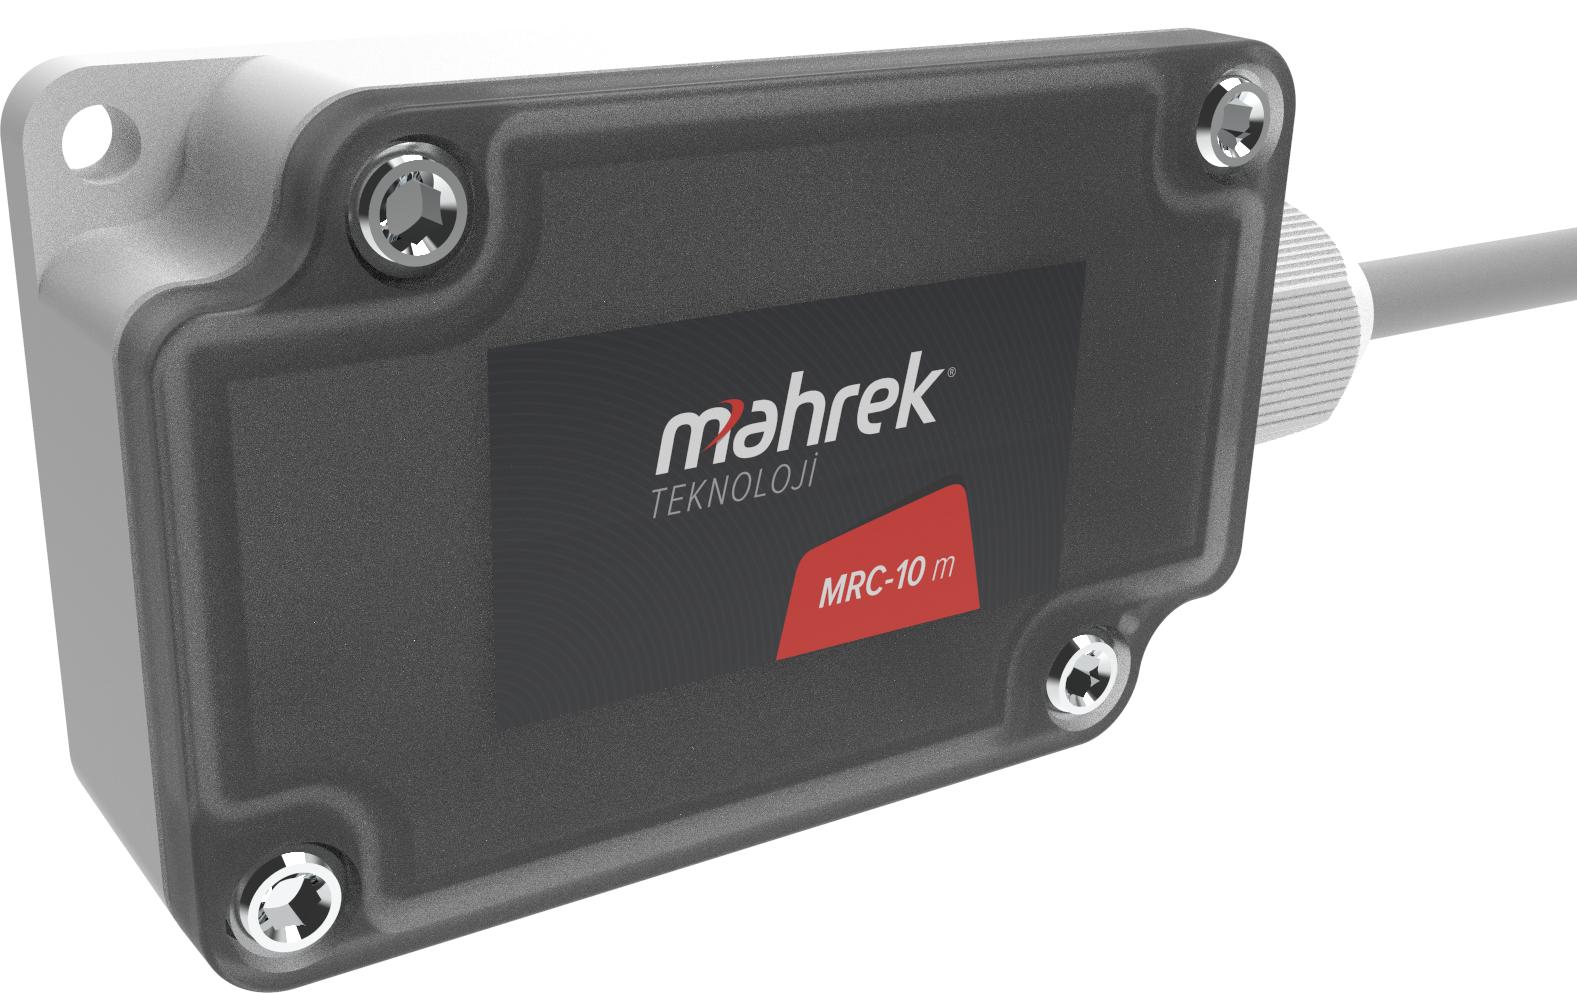 Mahrek MRC-10m Tracking device